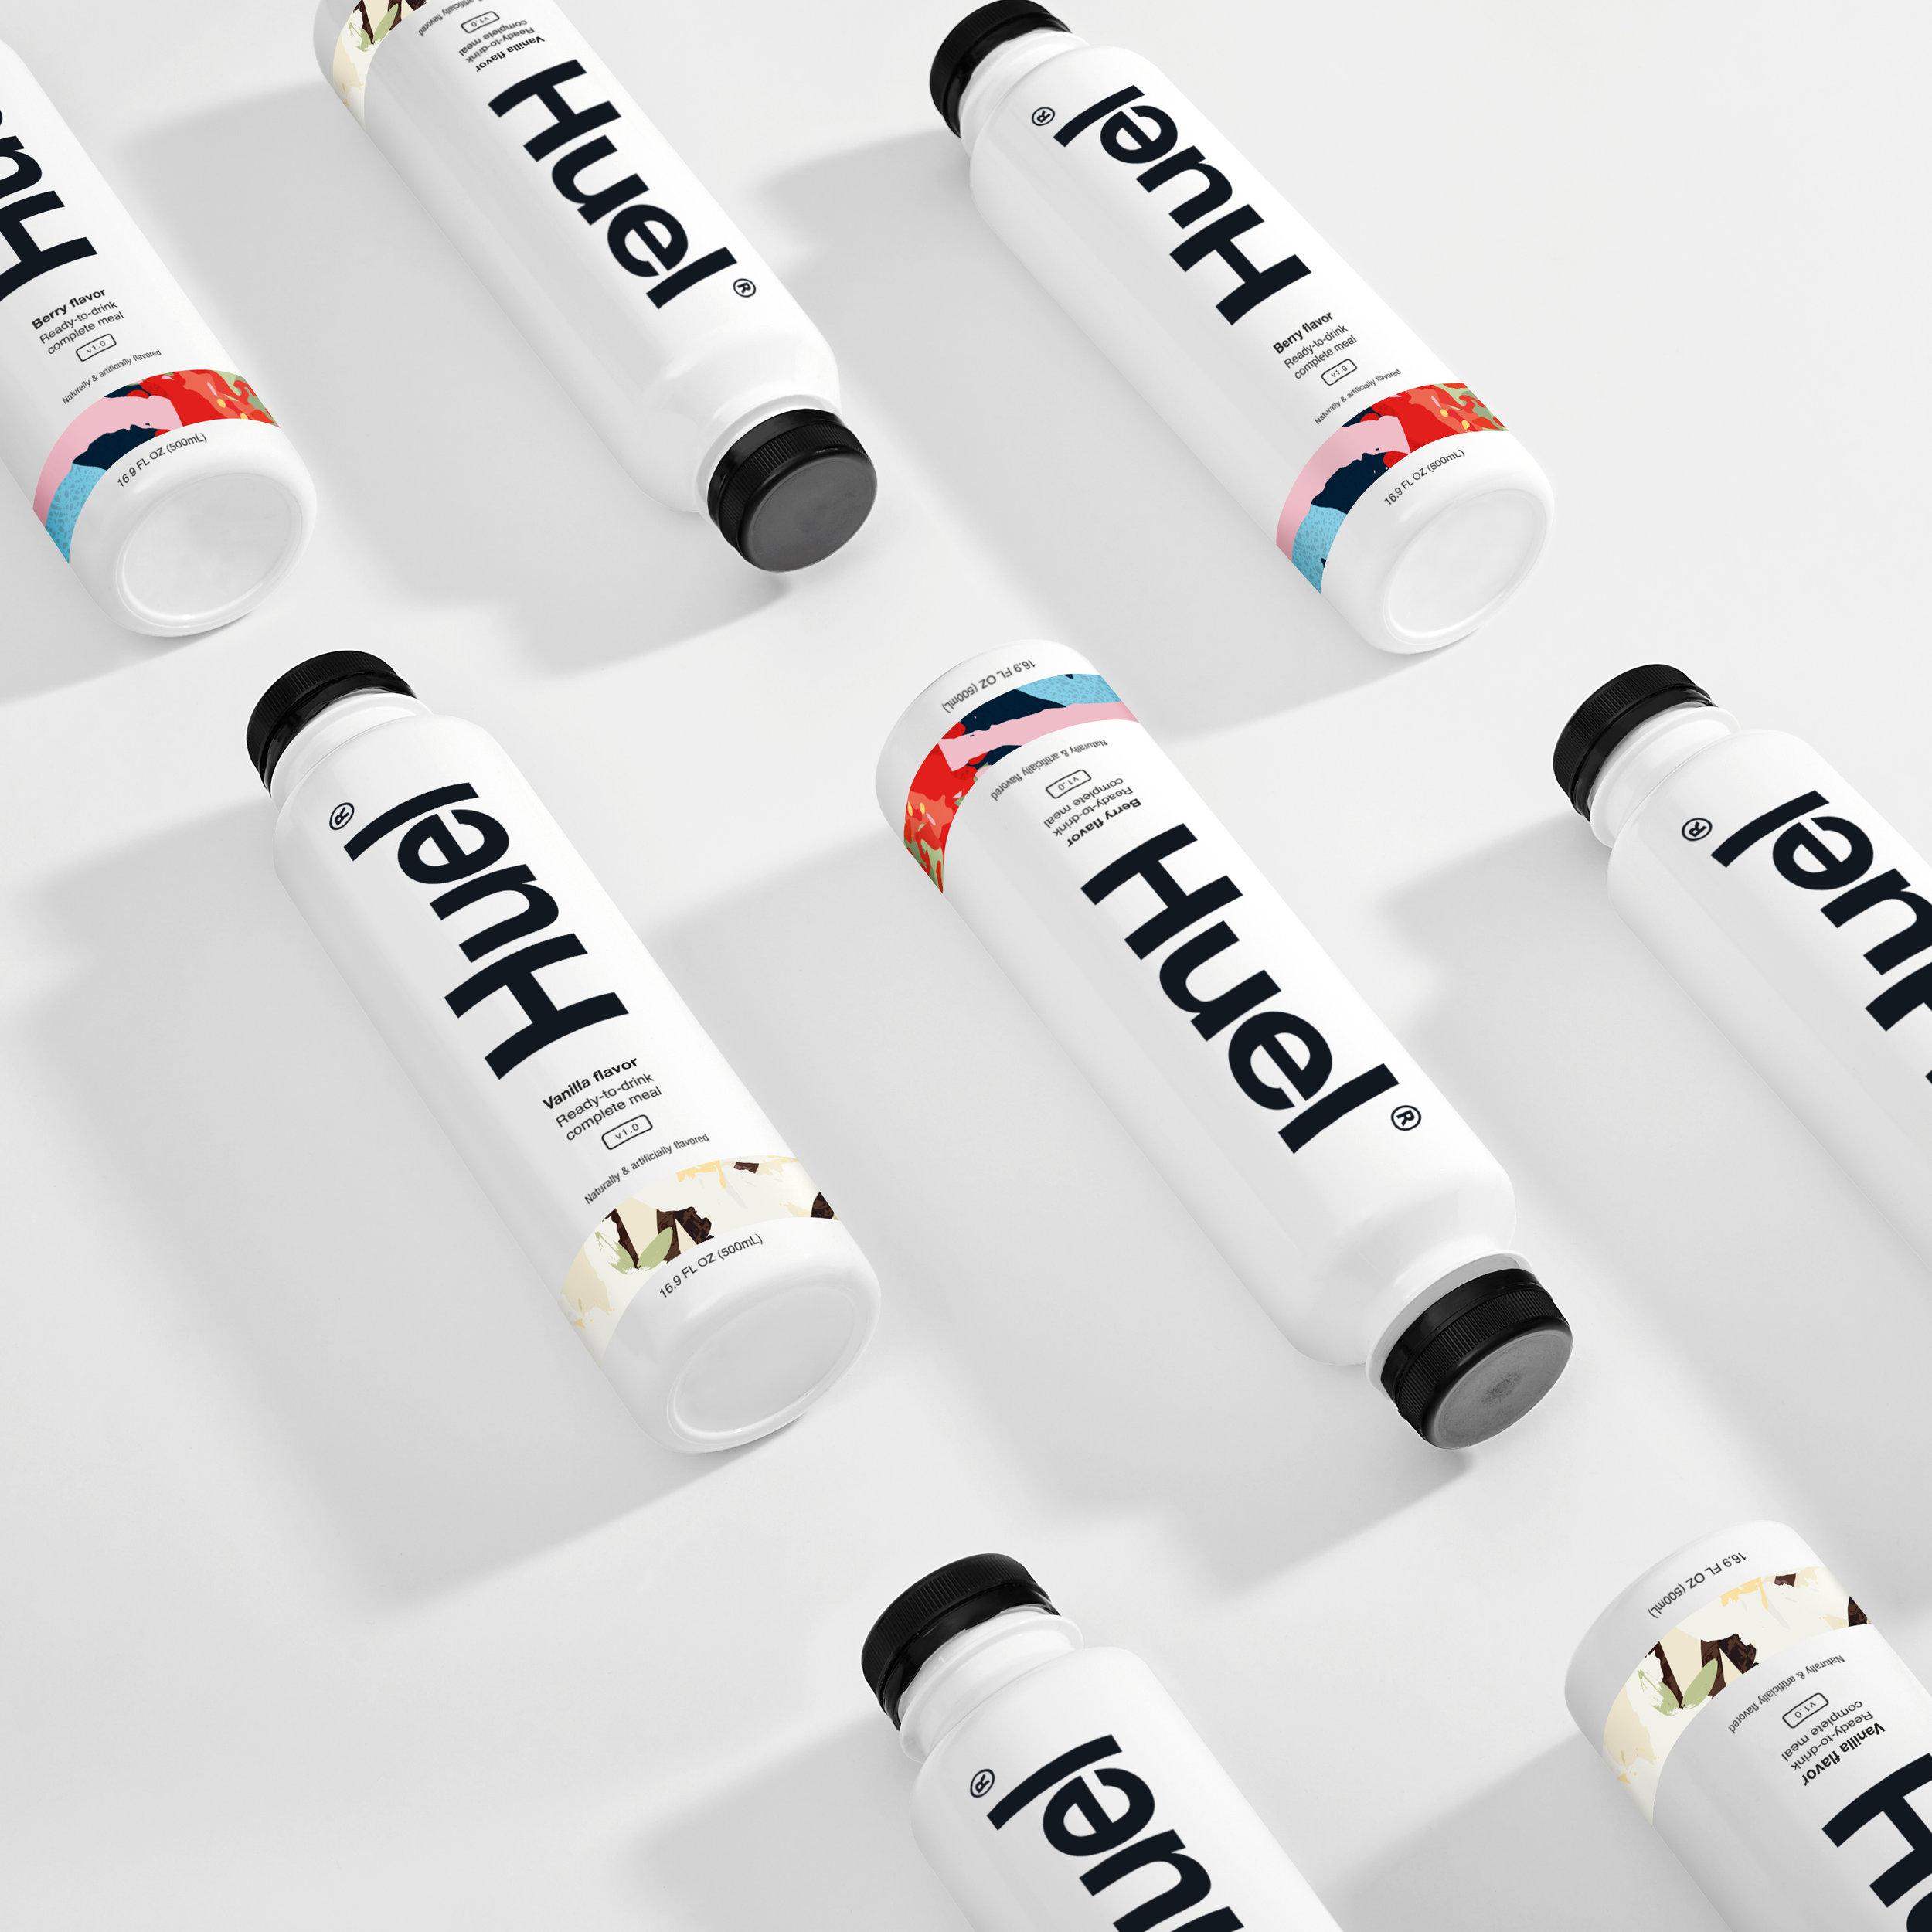 Huel Ready-to-drink group.jpg